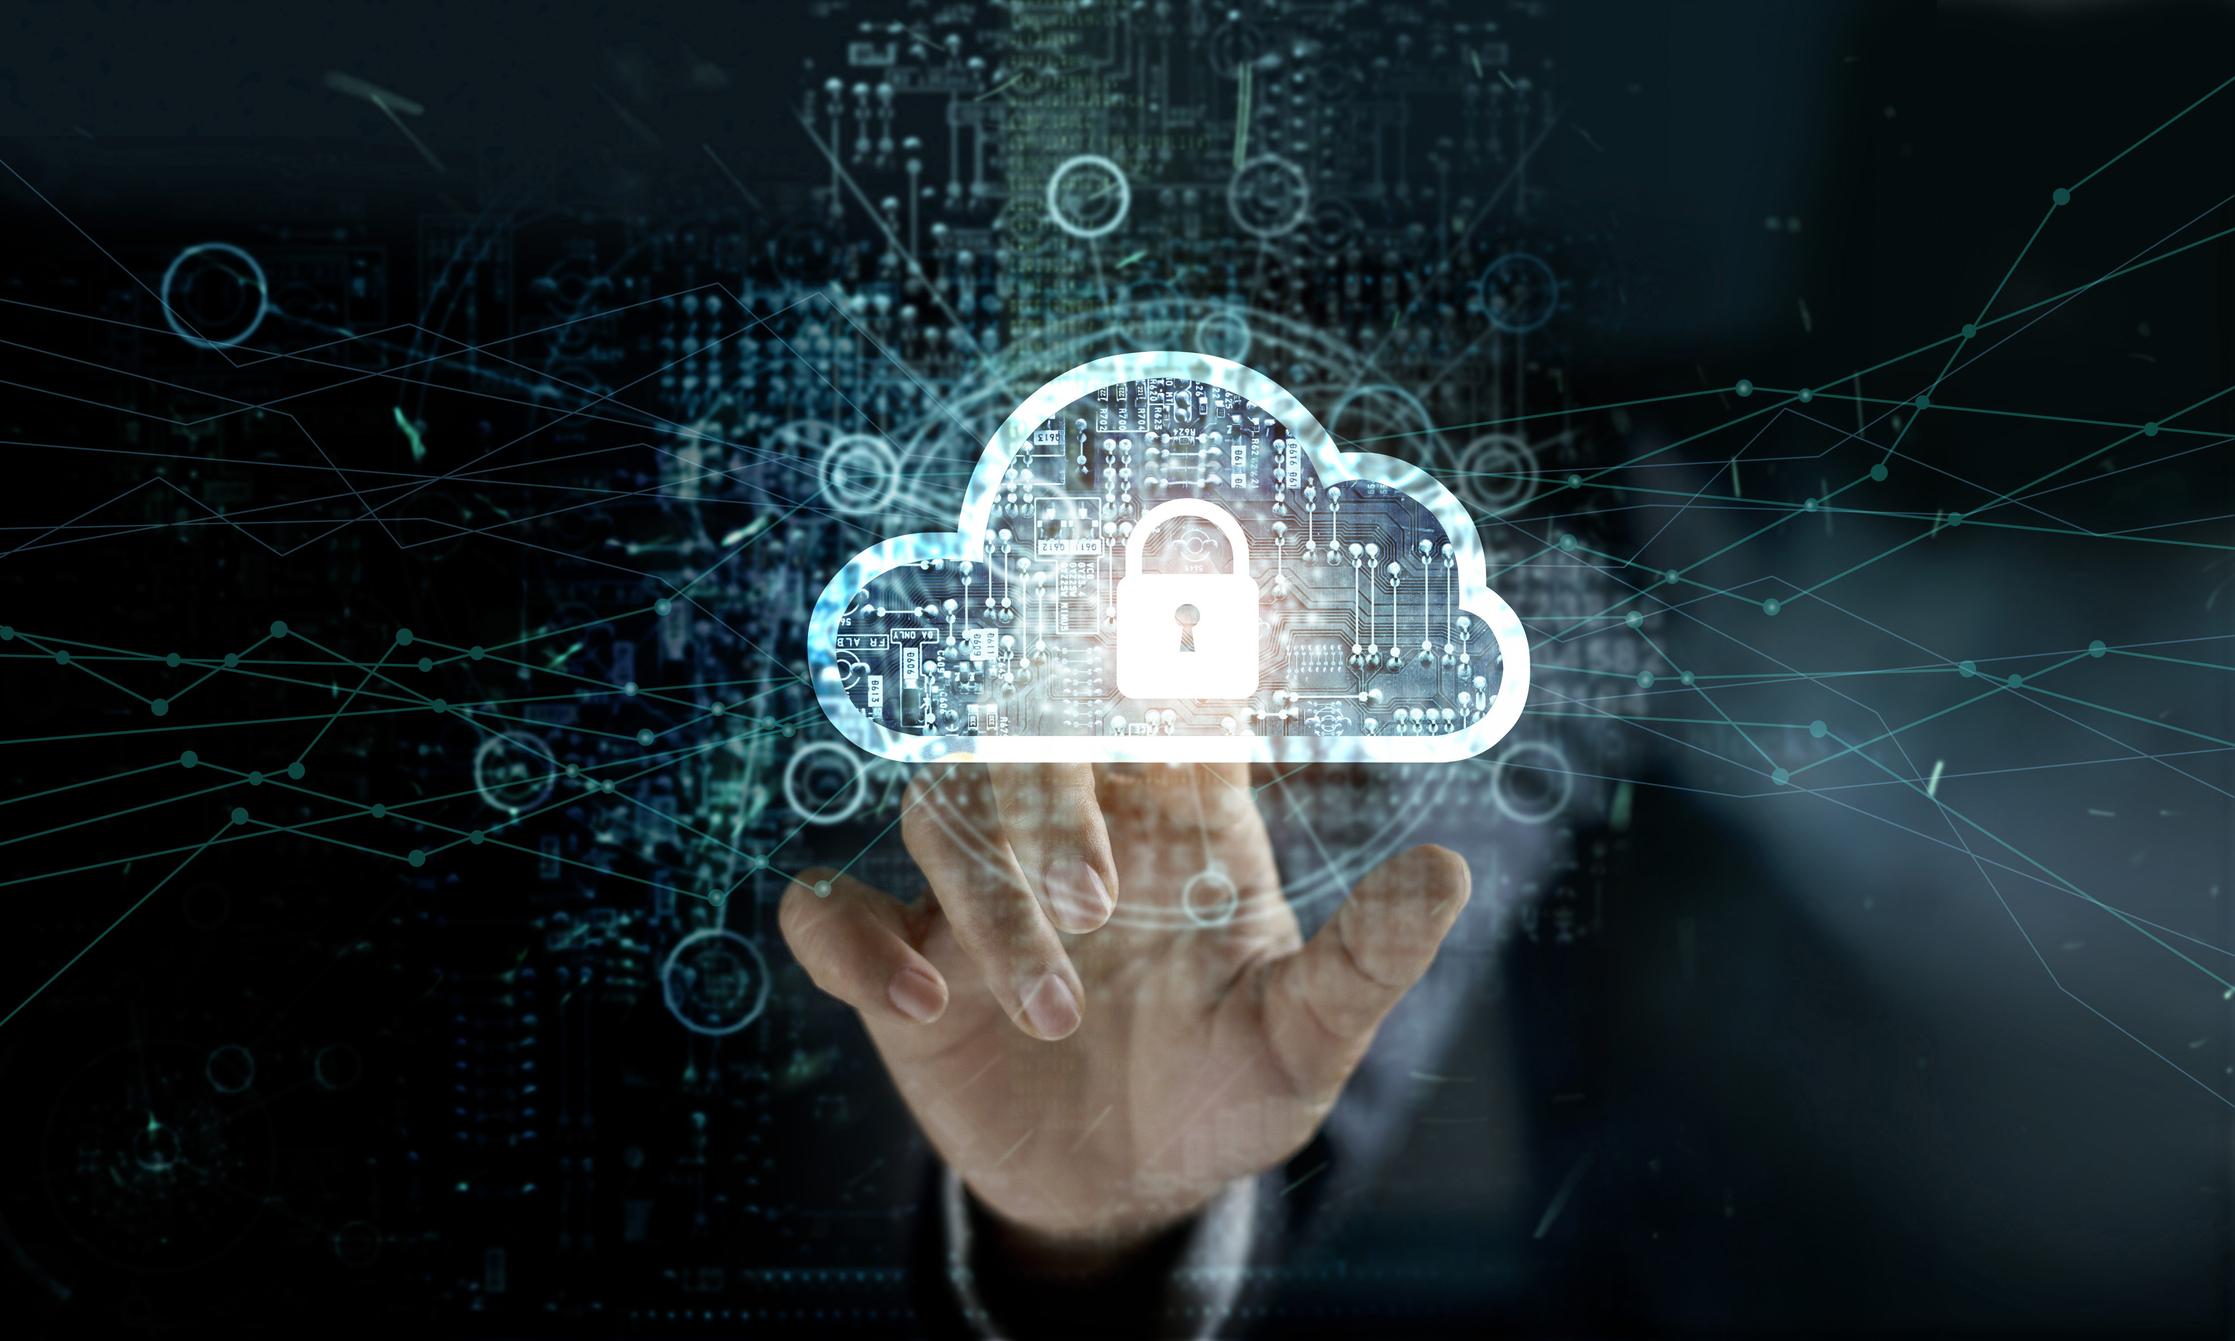 Palo Alto Networks' Plan to Acquire CloudGenix Makes Sense | The Motley Fool